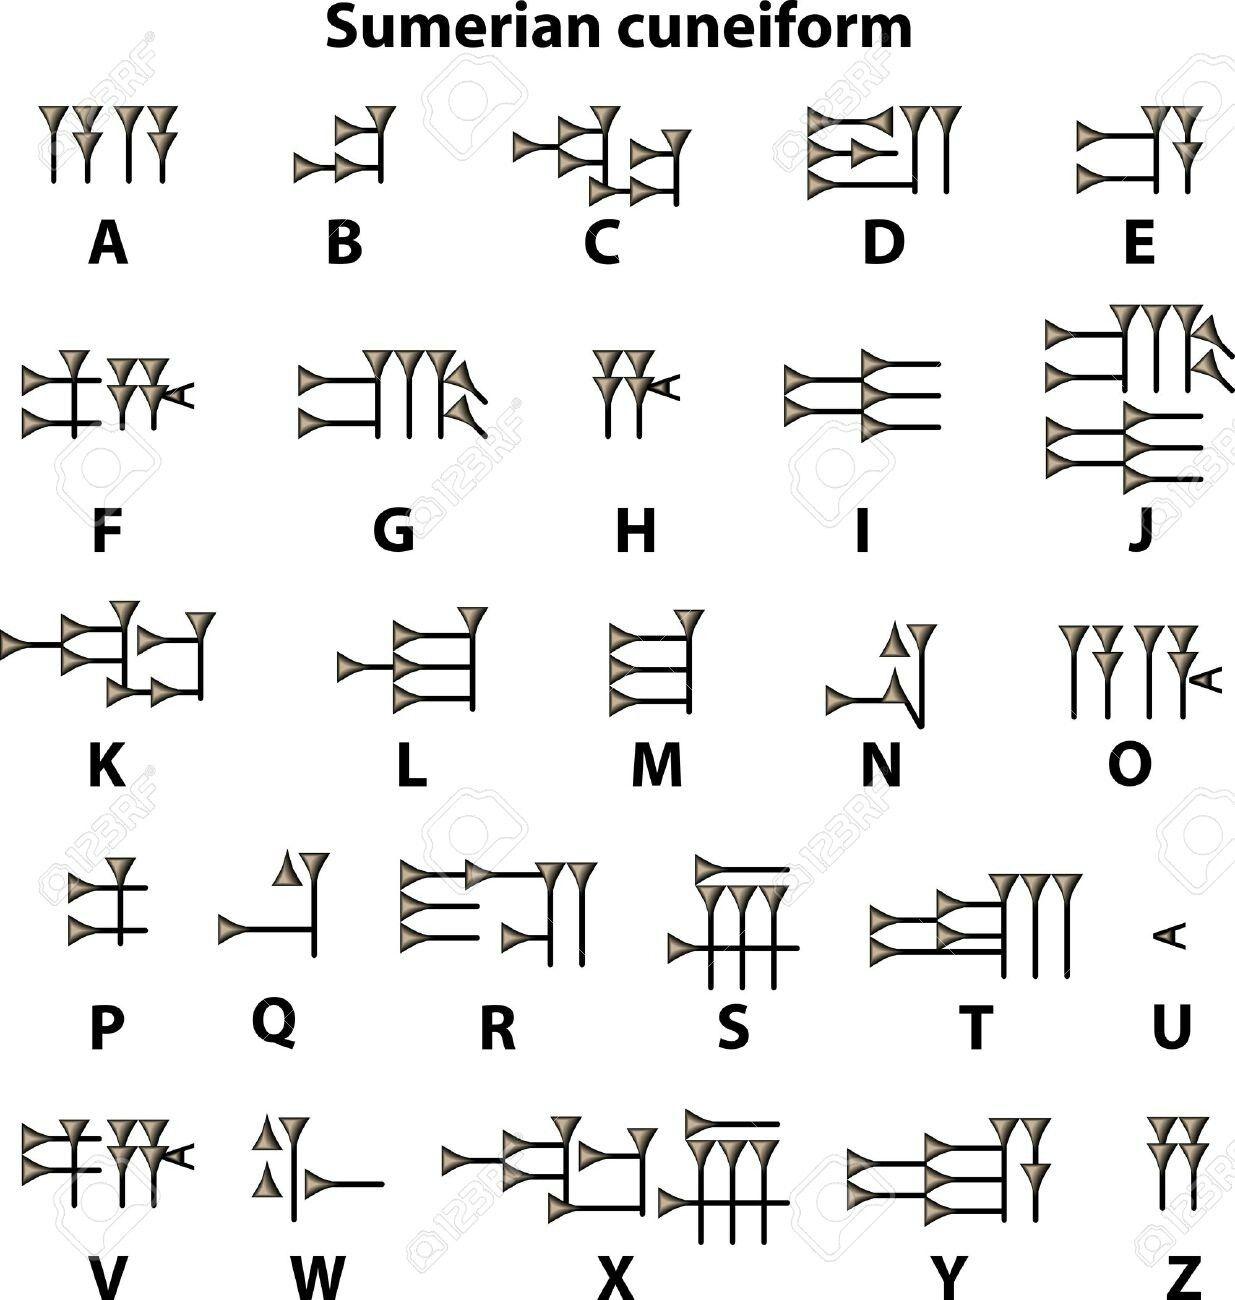 Pin By Aljimar Pakkam On Alphabetical World And Fictional